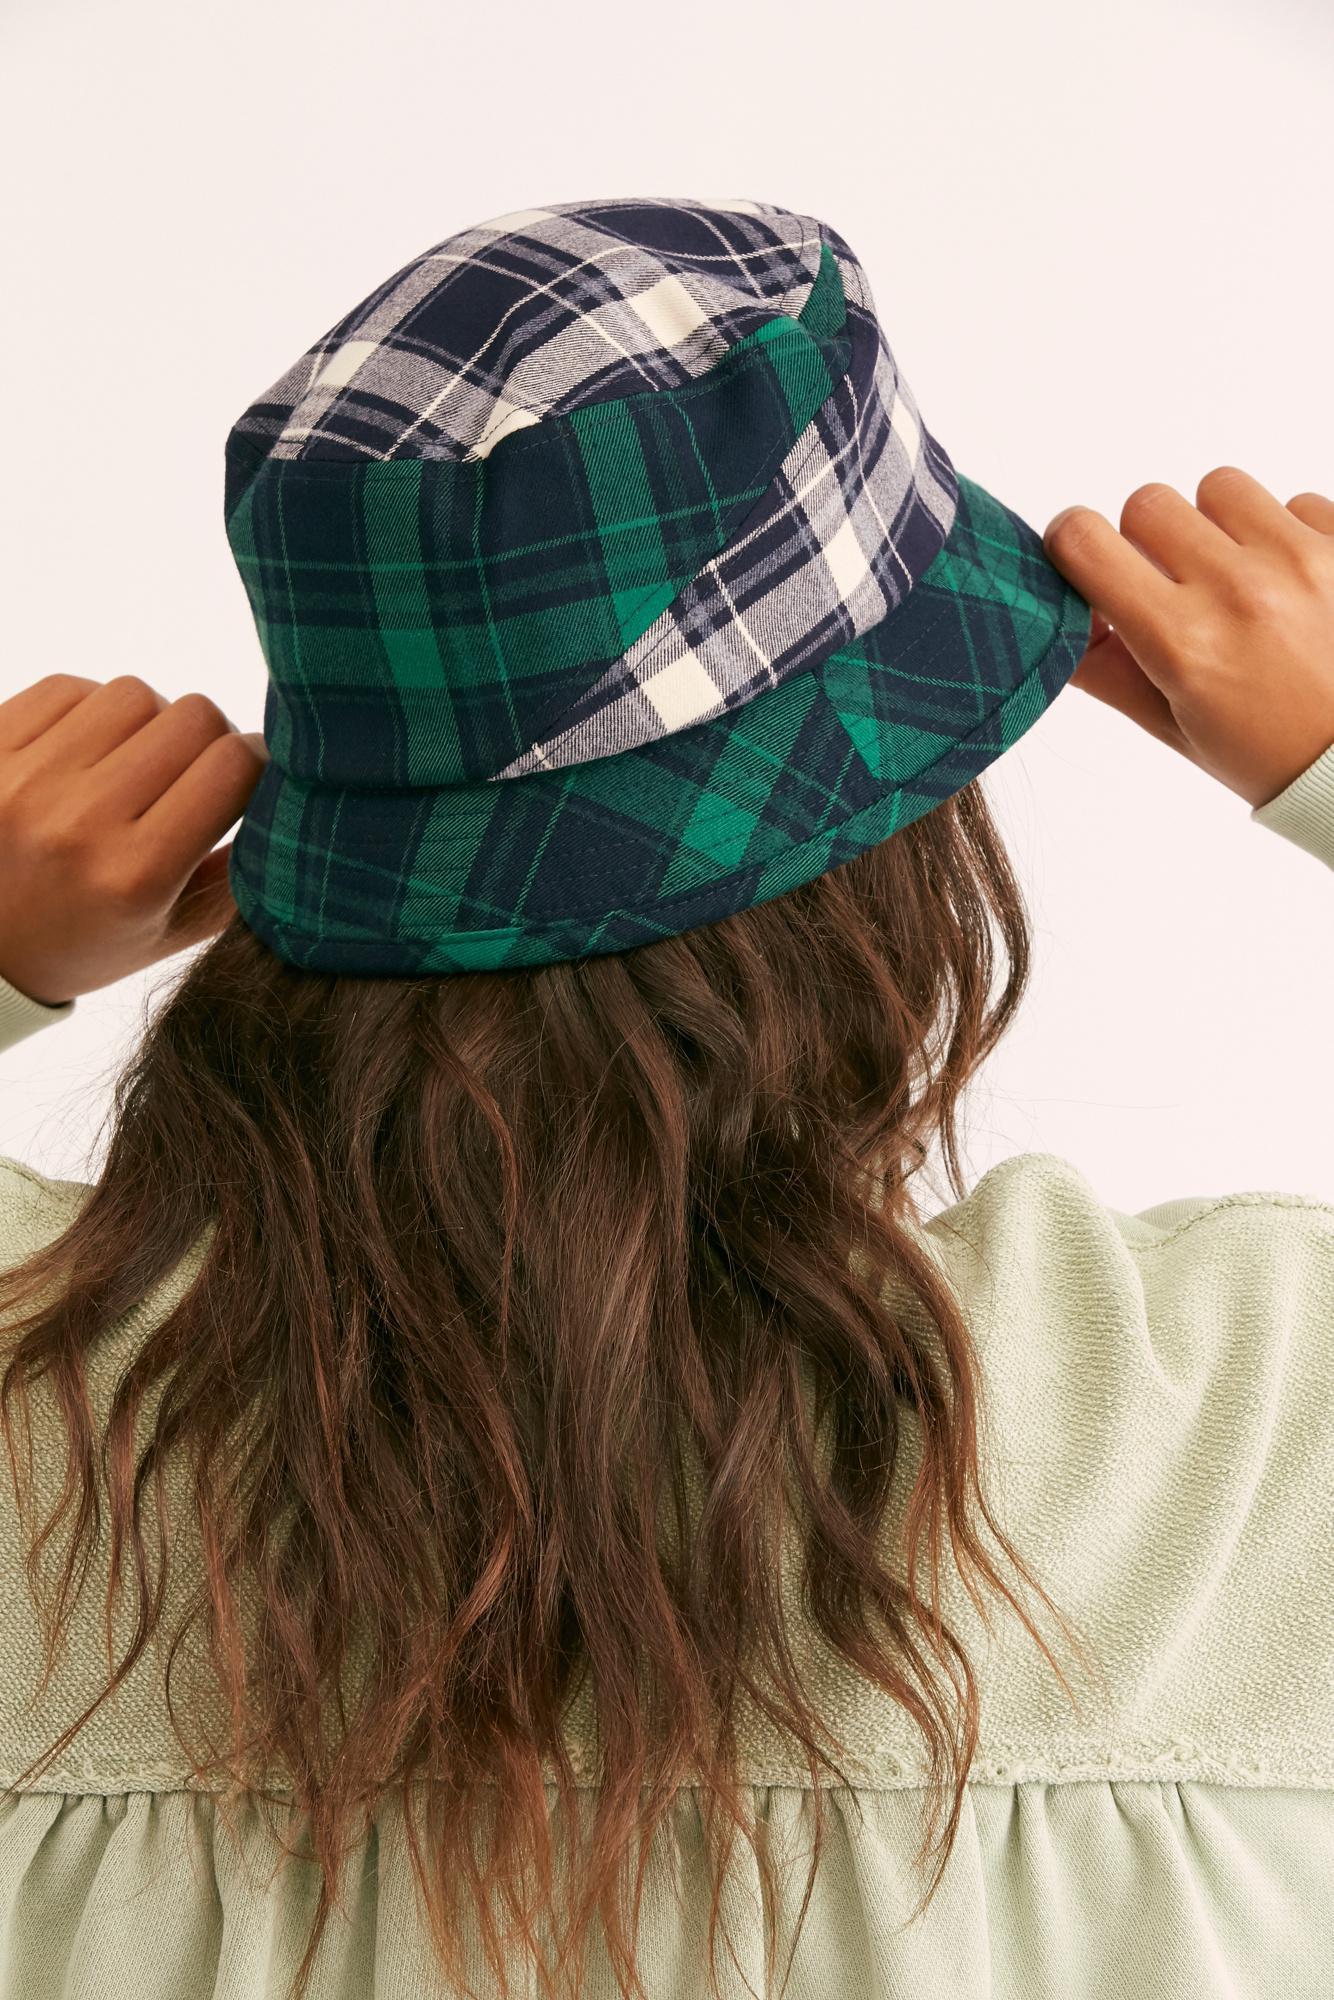 6b760597466ce4 Free People Kangol Plaid On Plaid Bucket Hat in Blue - Lyst